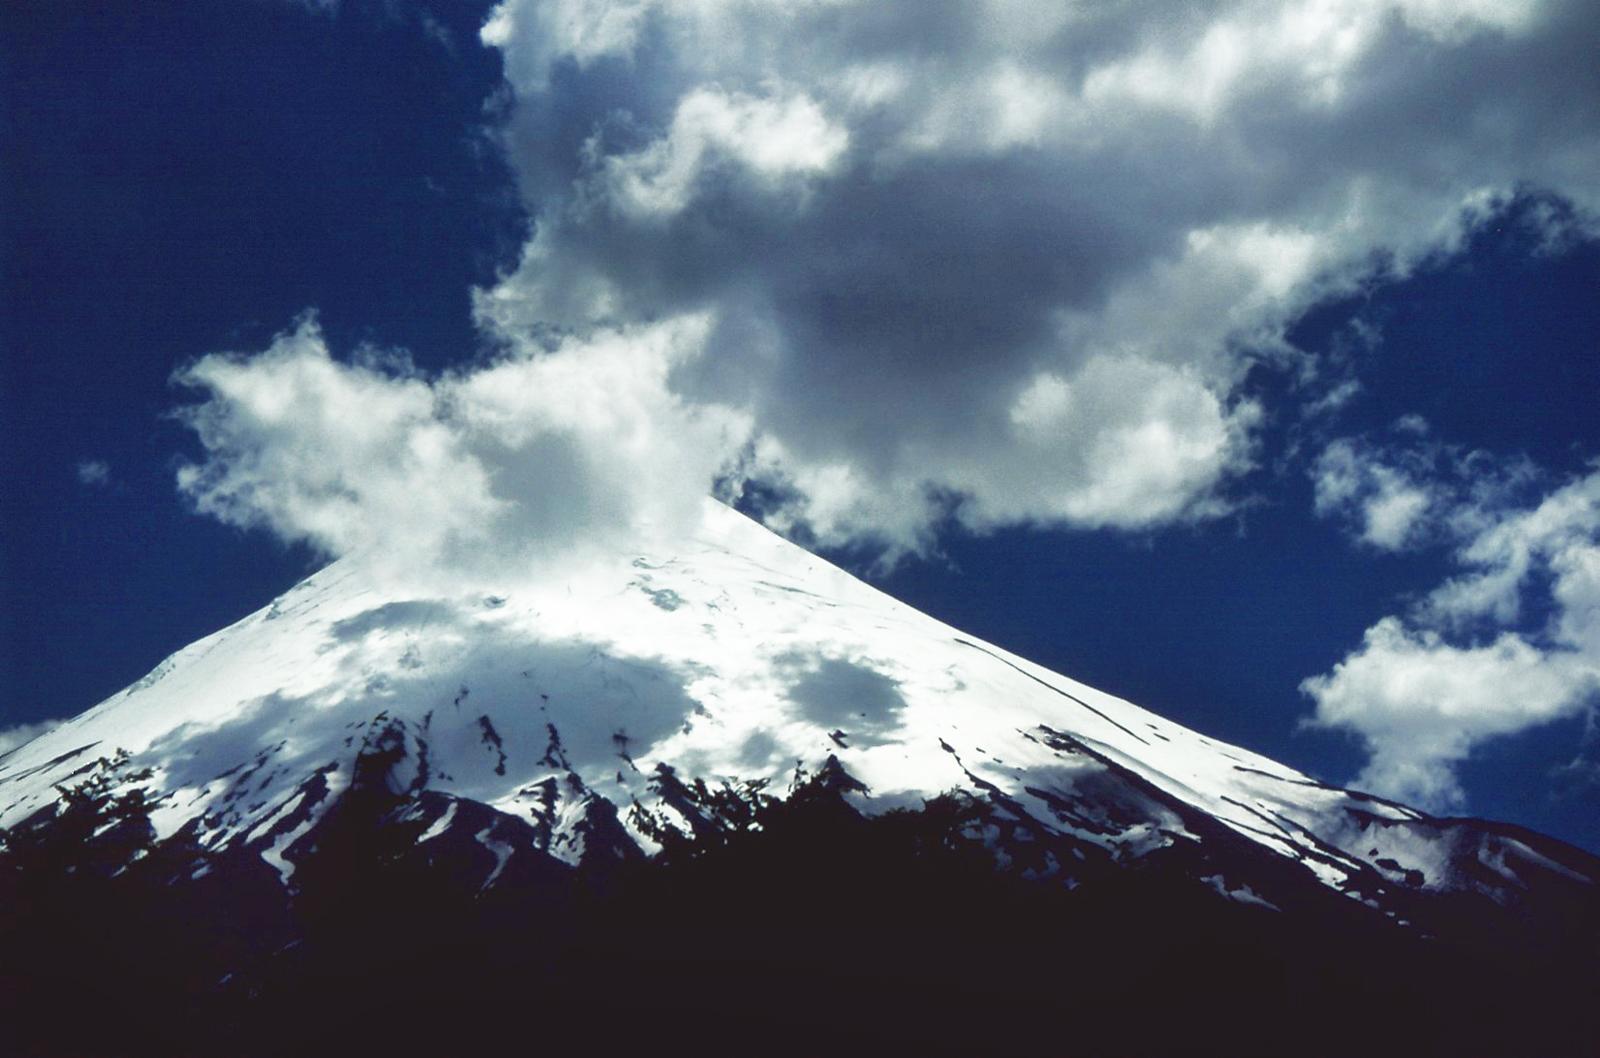 Volcán_Osorno,_Perez_Rosales_National_Park,_Southern_Chile